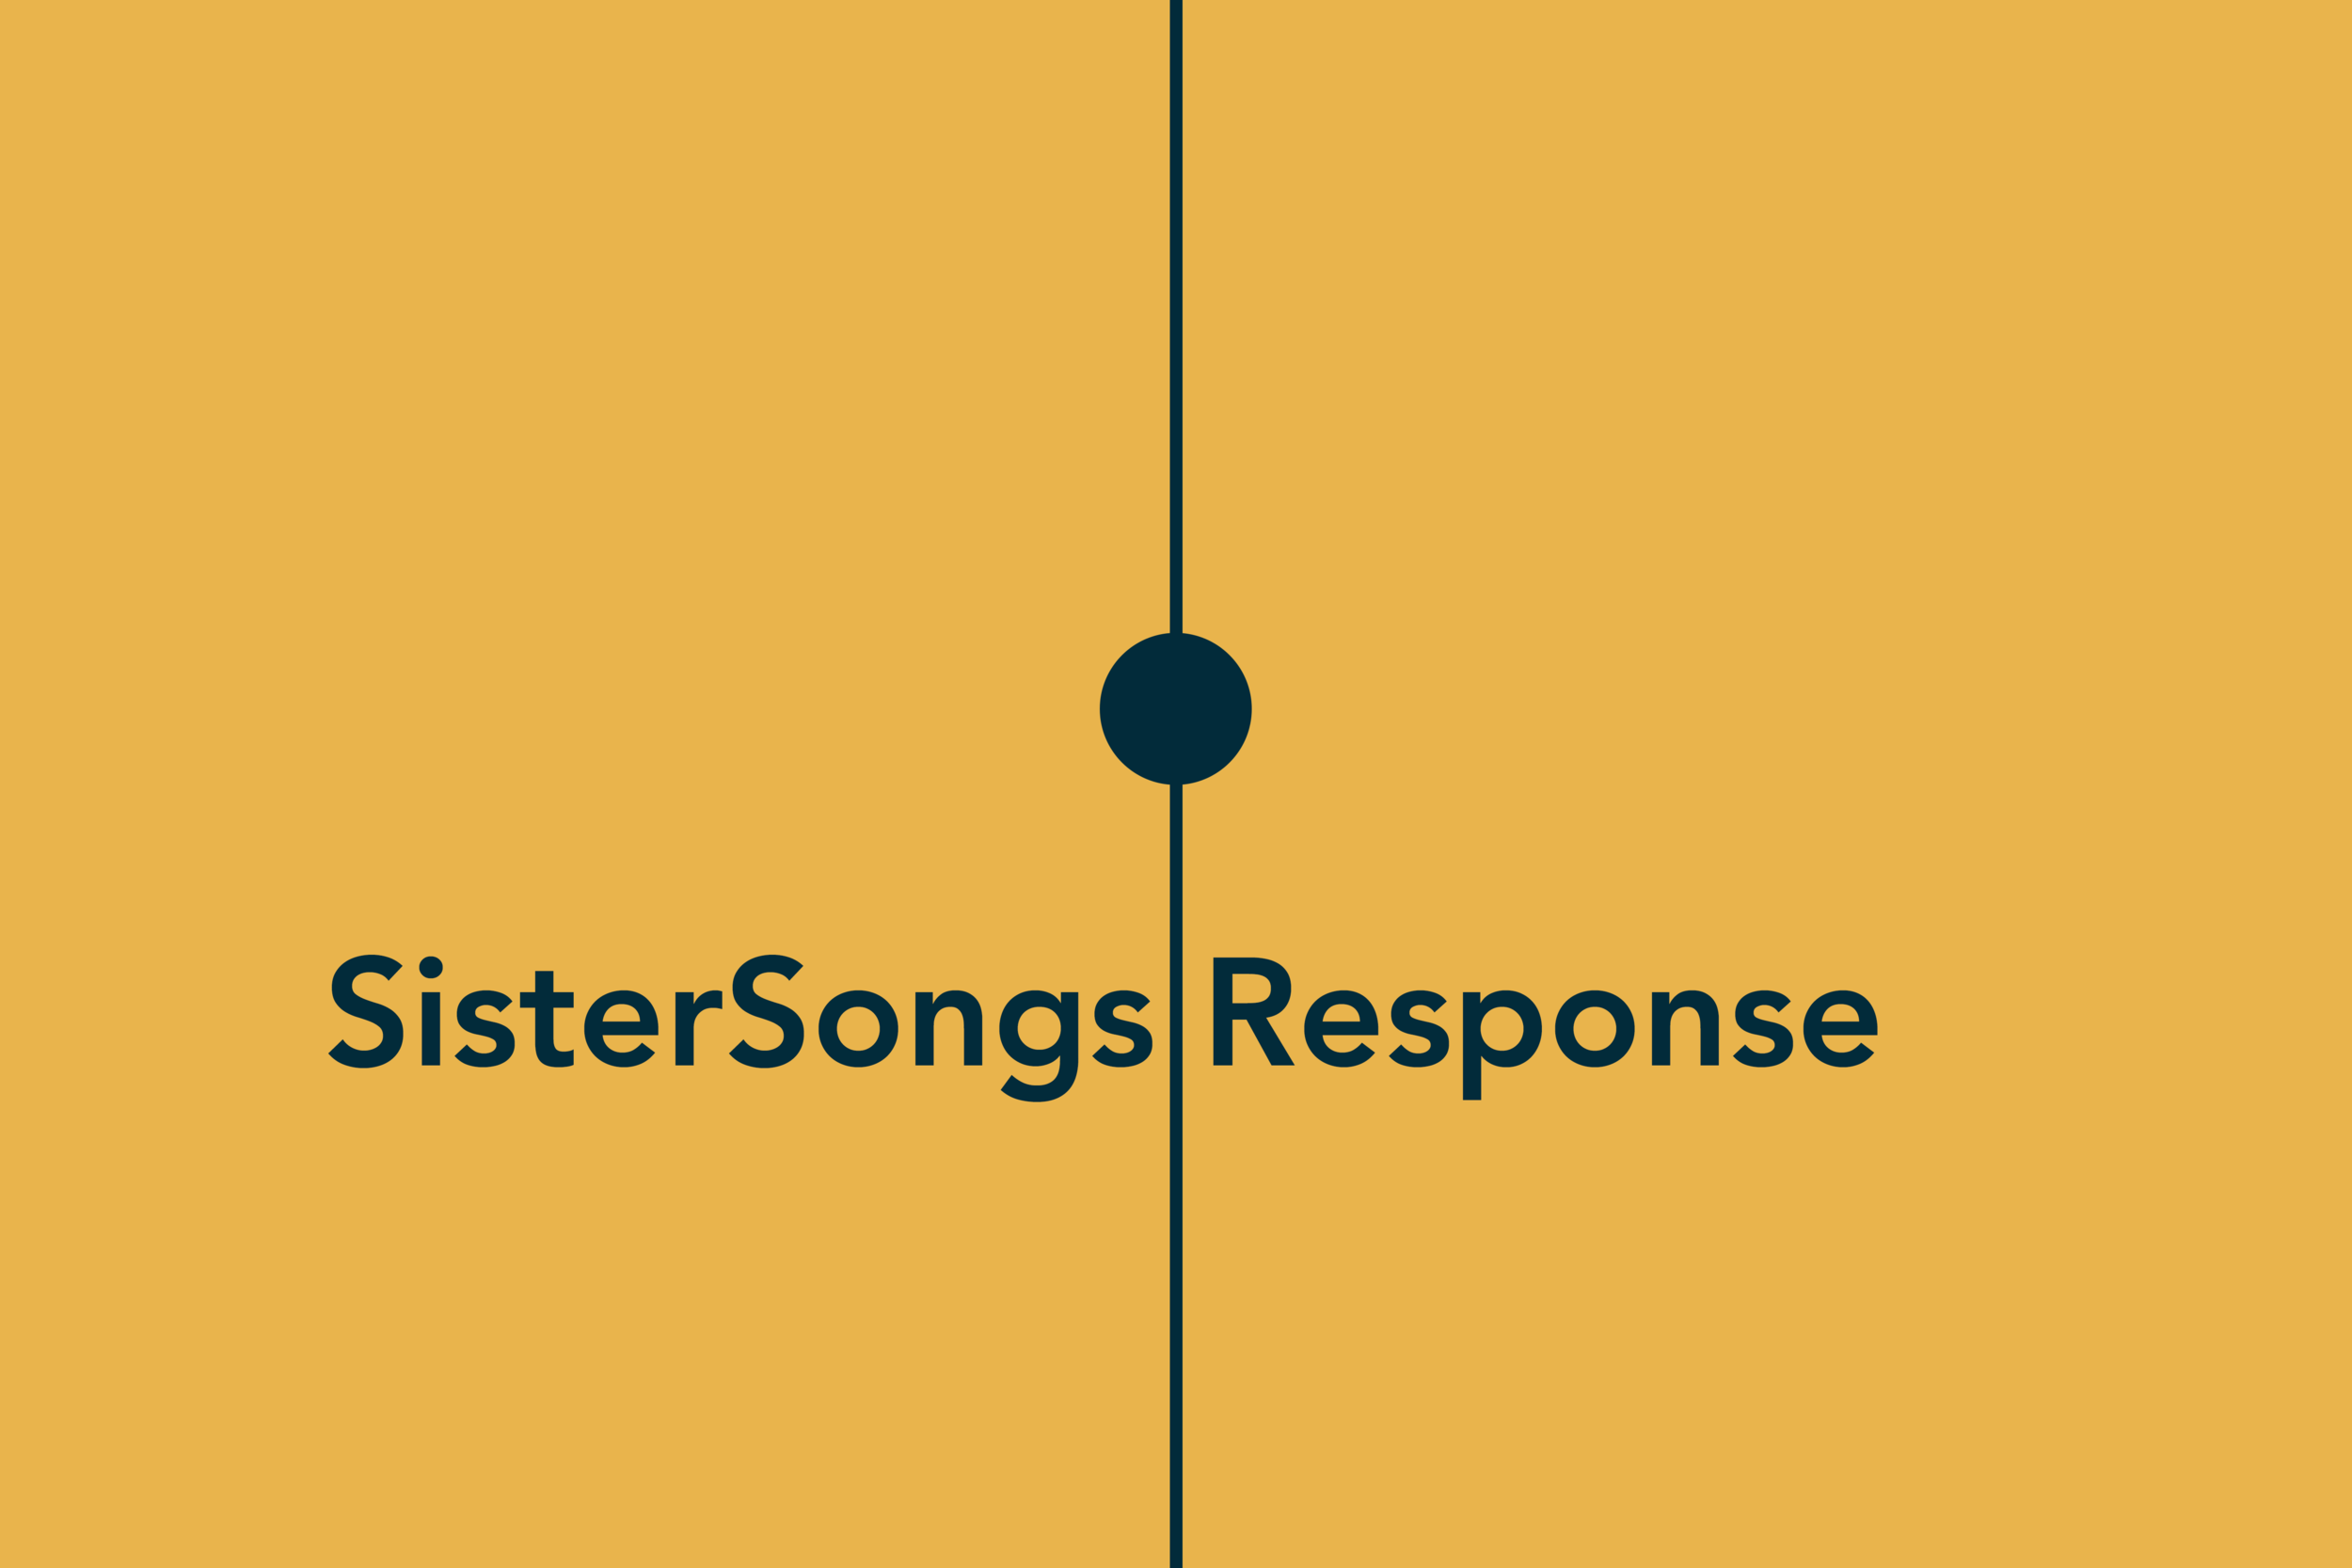 SisterSongsResponse.png